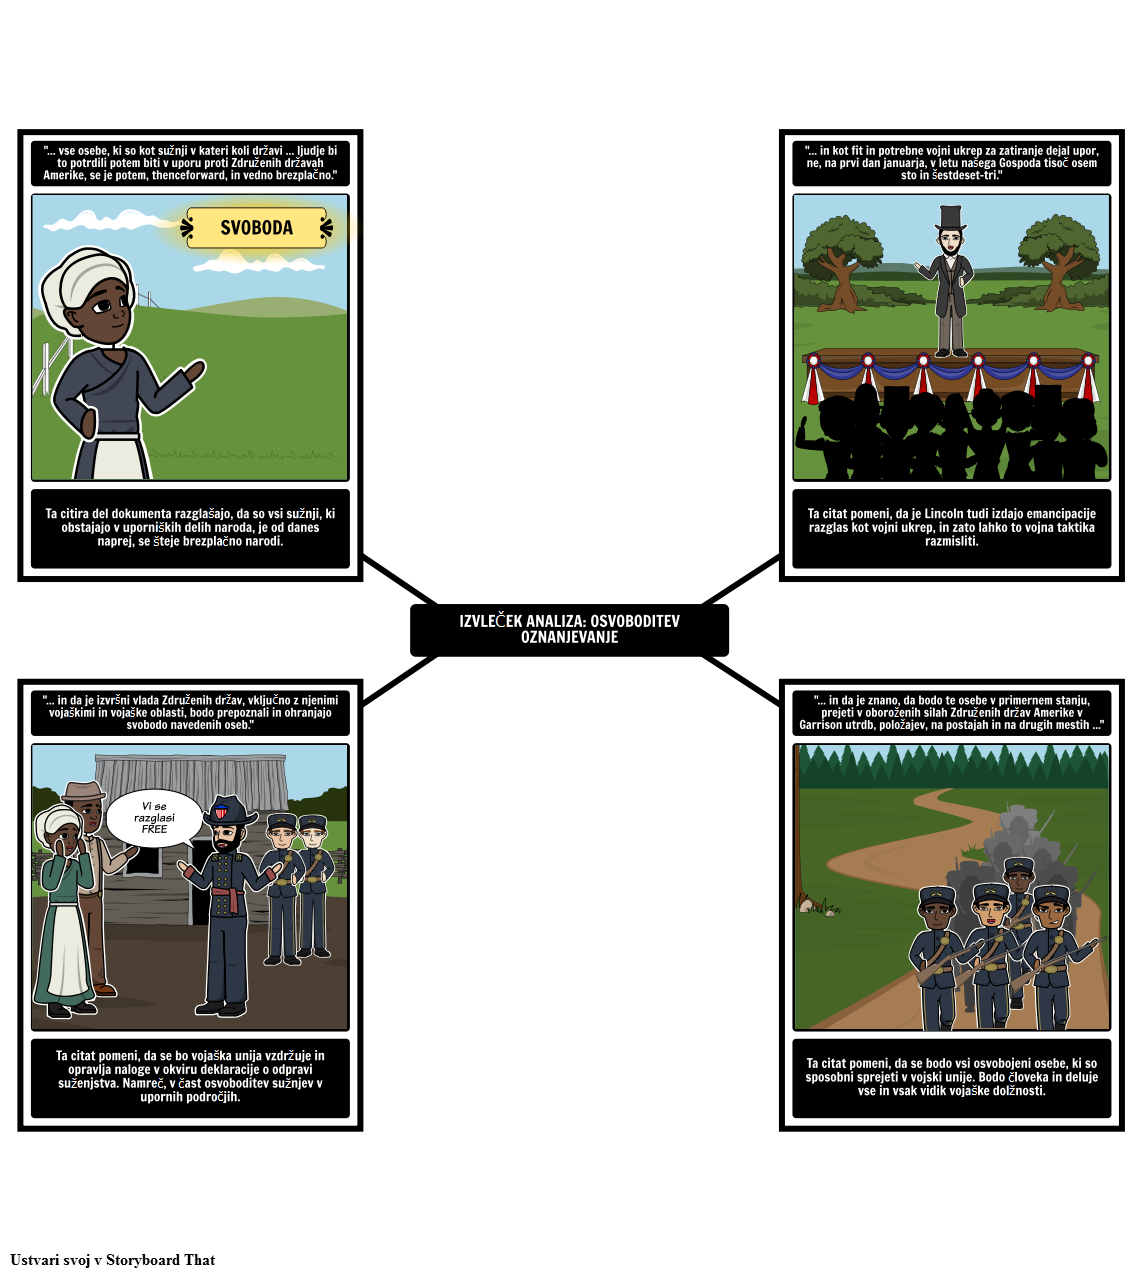 Analiza Emancipacija Razglasitev Odlomek